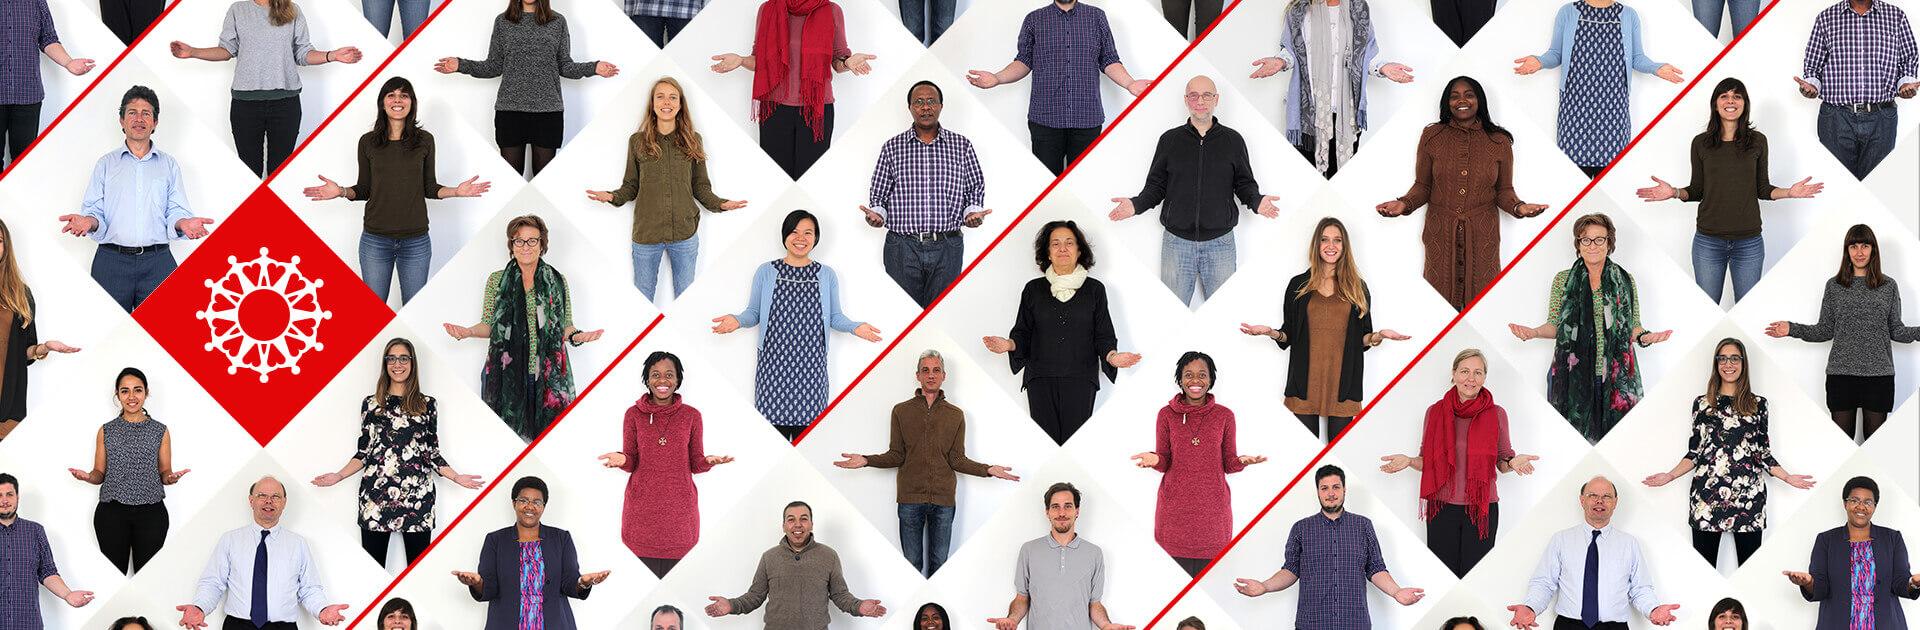 Caritas International België Samen op weg #ShareJourney